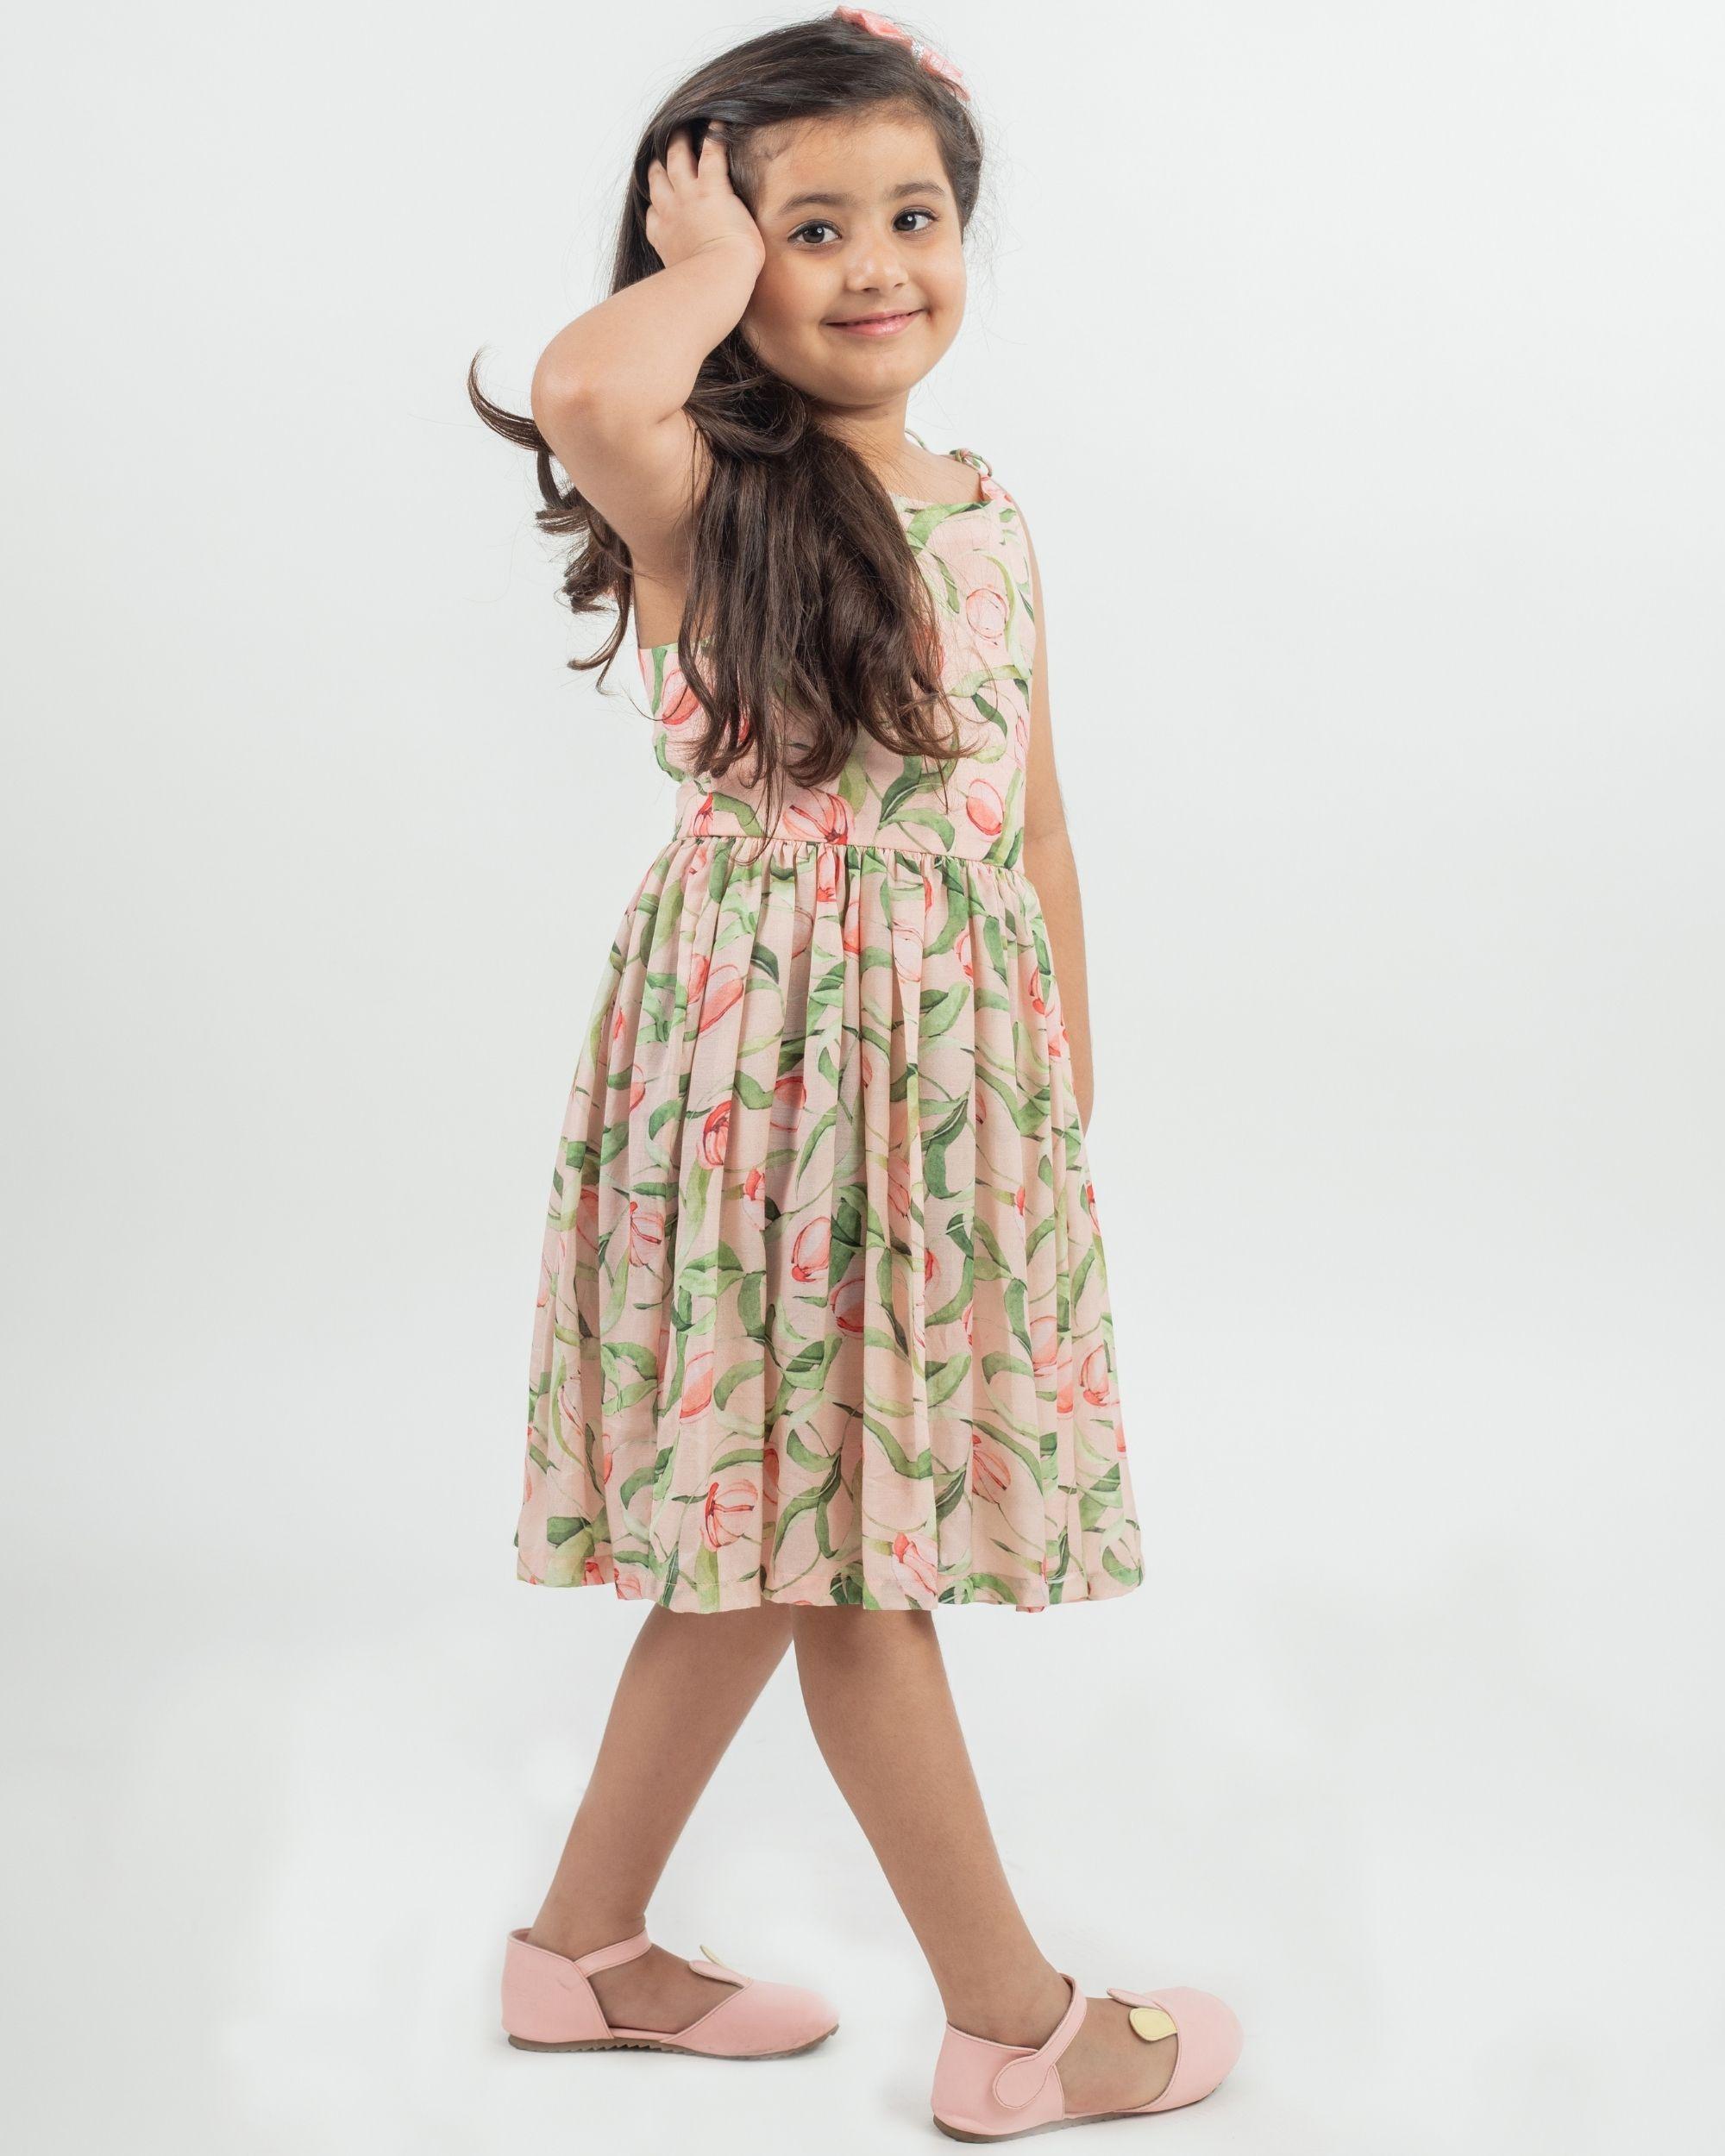 Beige floral printed knot dress